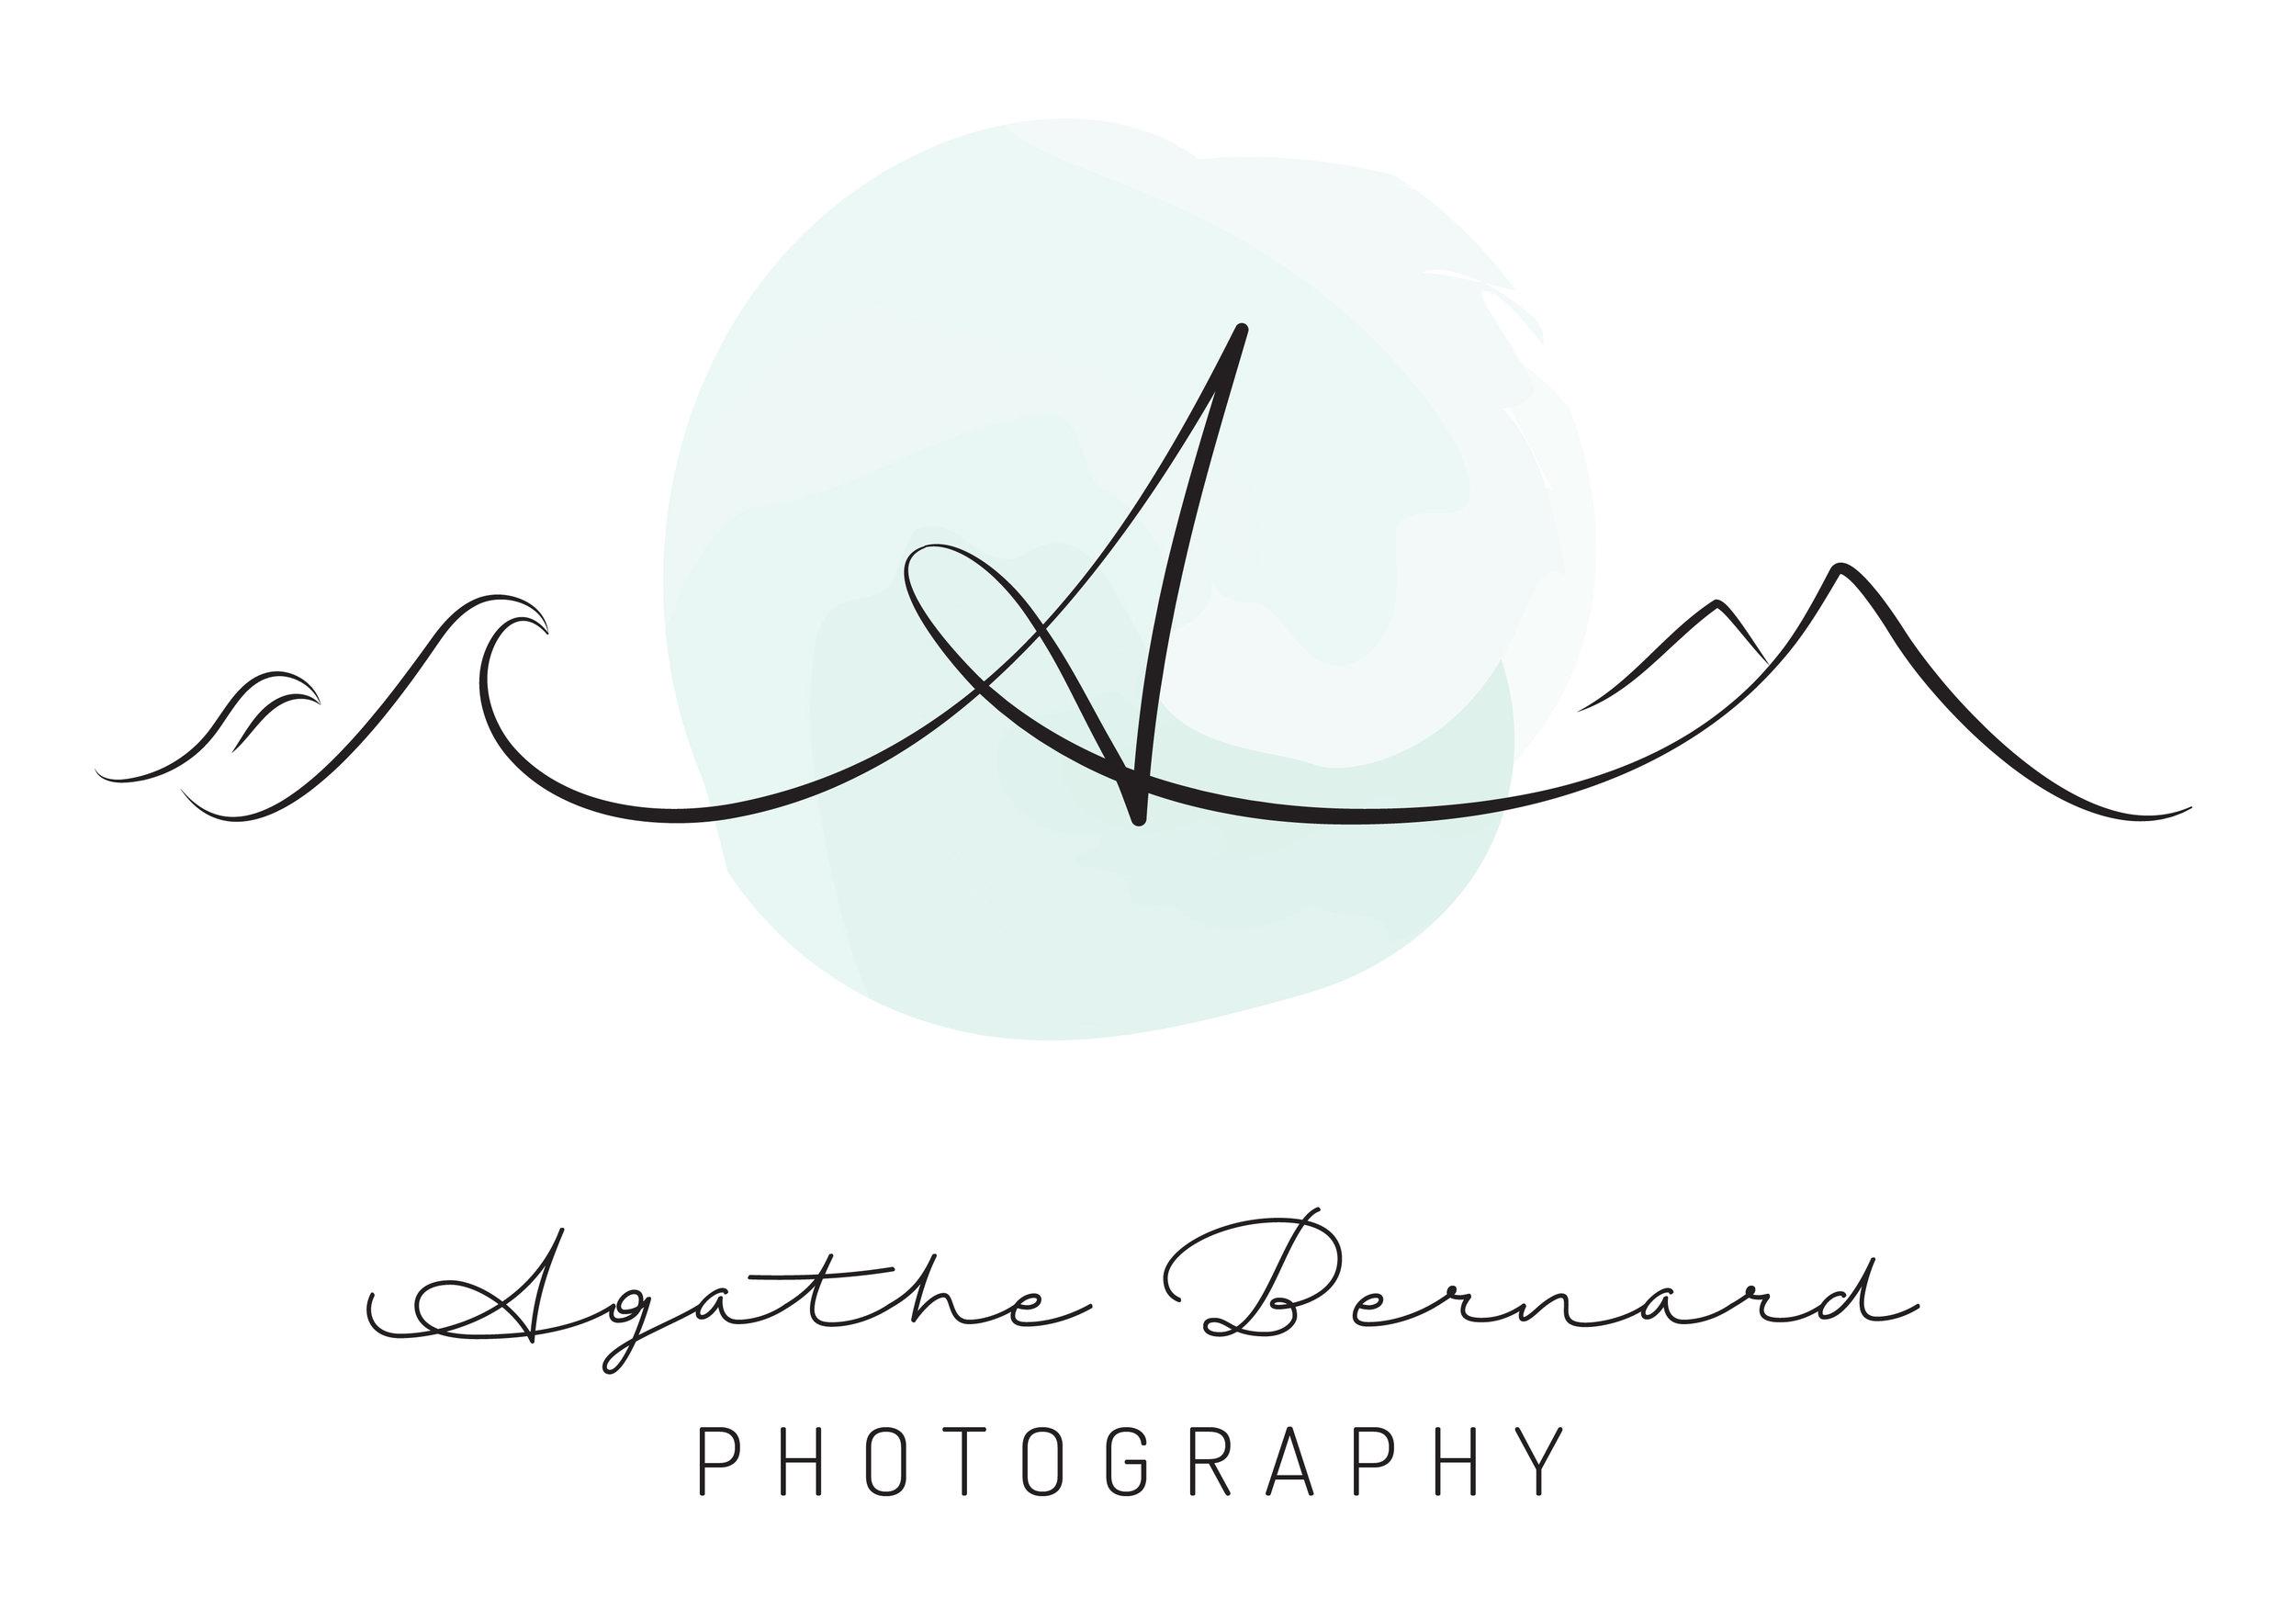 Agathe_Bernard_logo_black_waves_watercolour.jpg